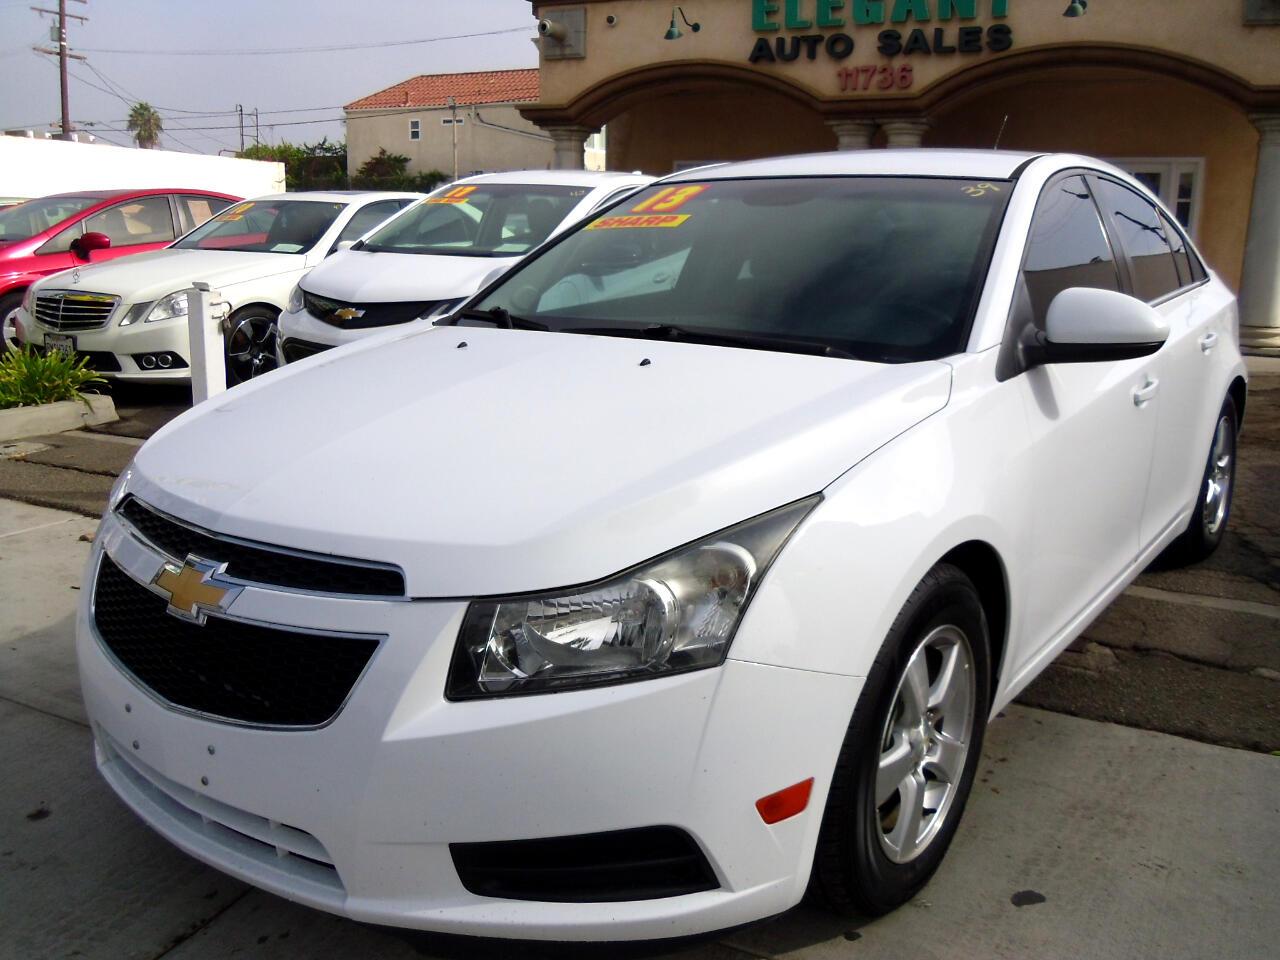 Chevrolet Cruze 4dr Sdn Auto 1LT 2013